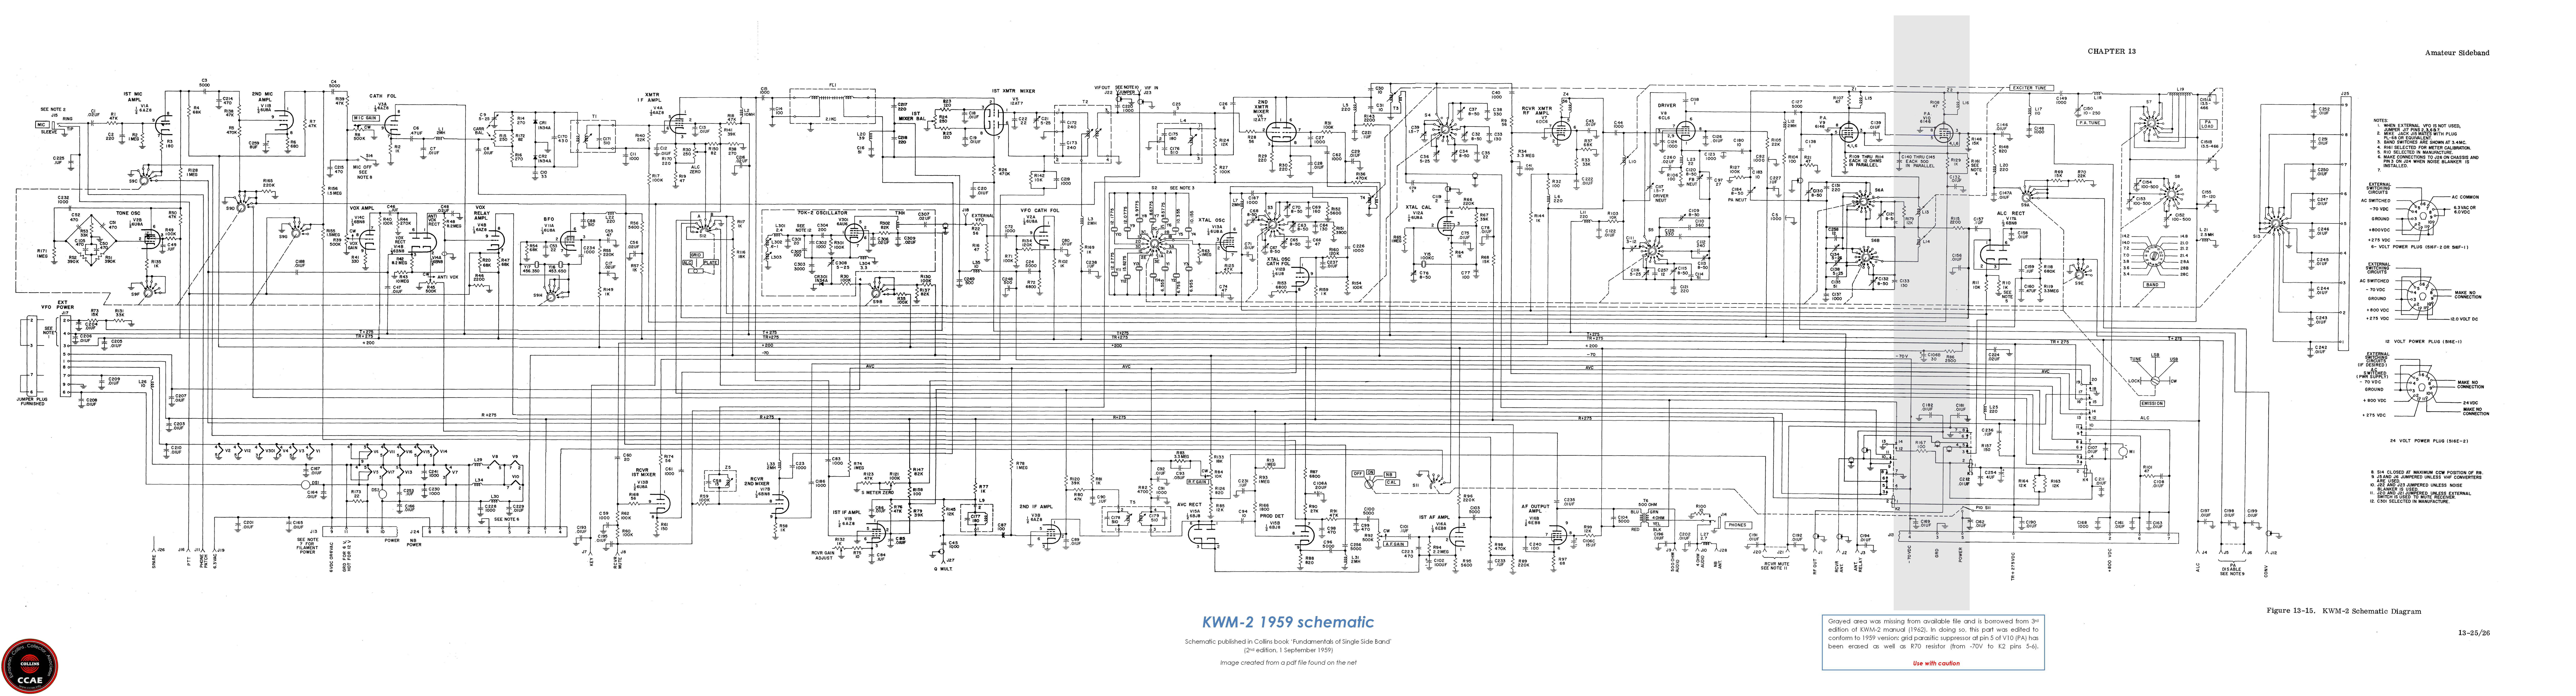 yamaha aerox yq 50 wiring diagram wiring diagrams wiring diagram yamaha vixion